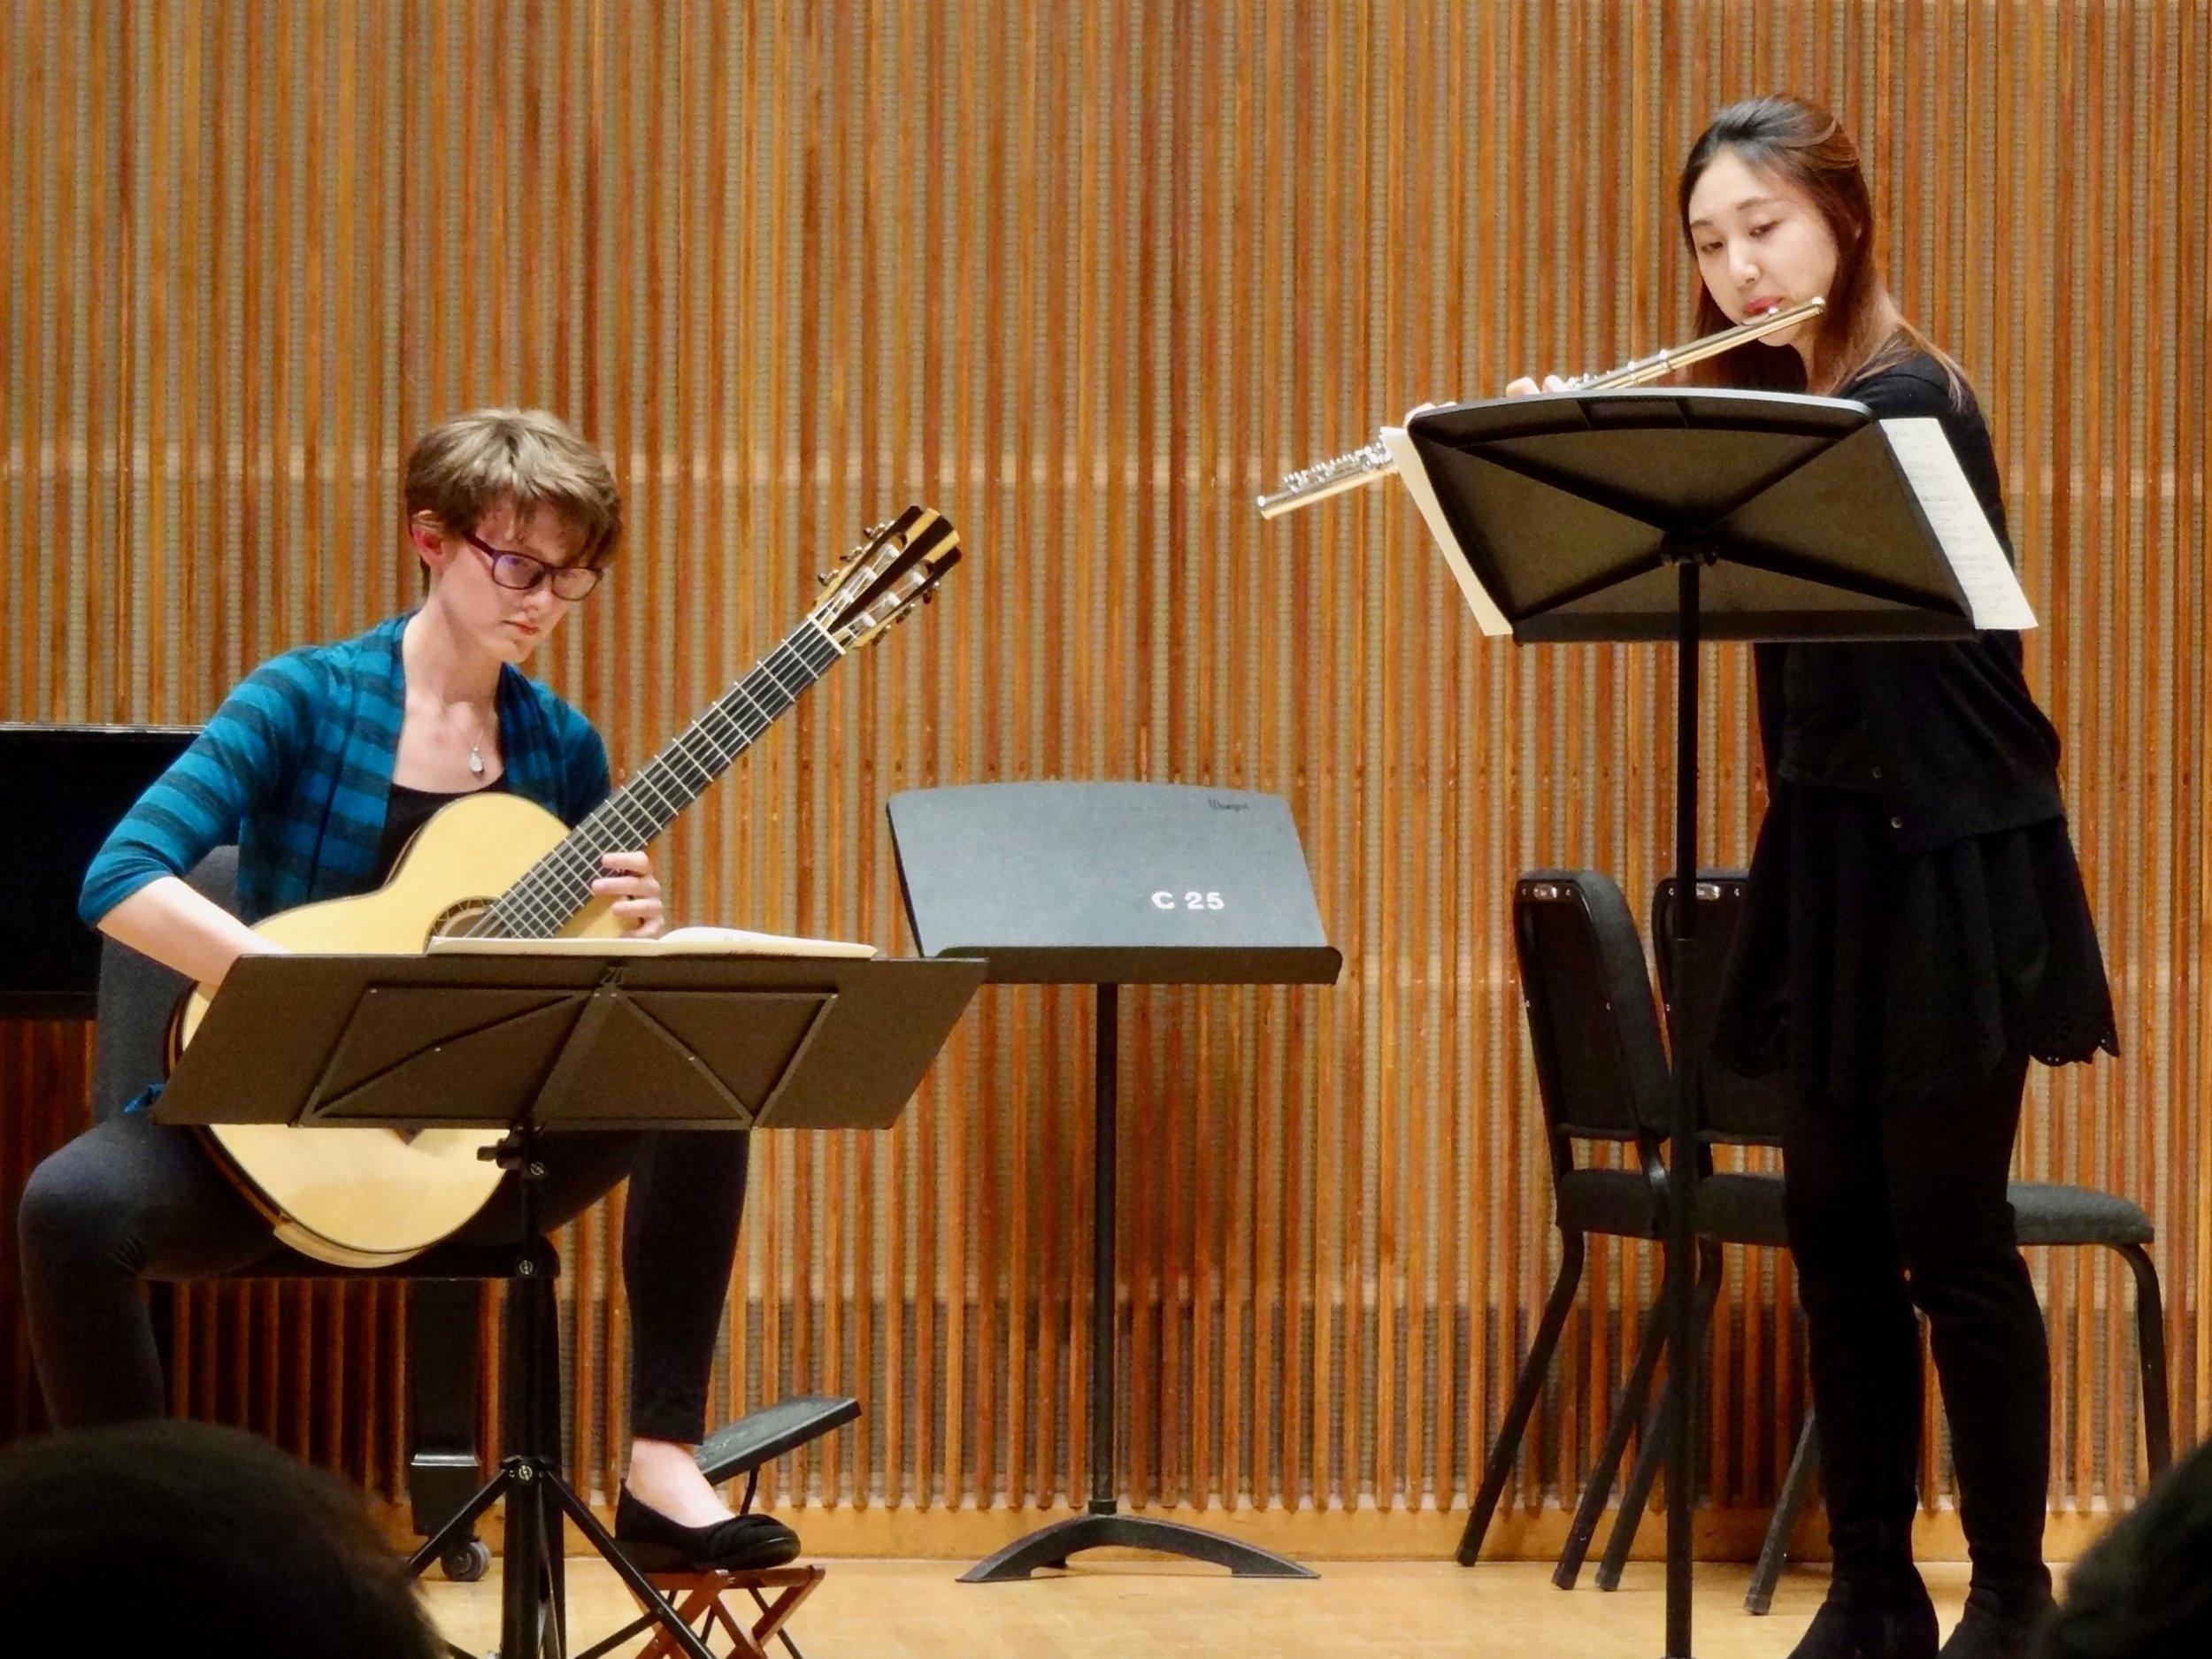 Caeli Massey and flutist Hexin Zhang play French music